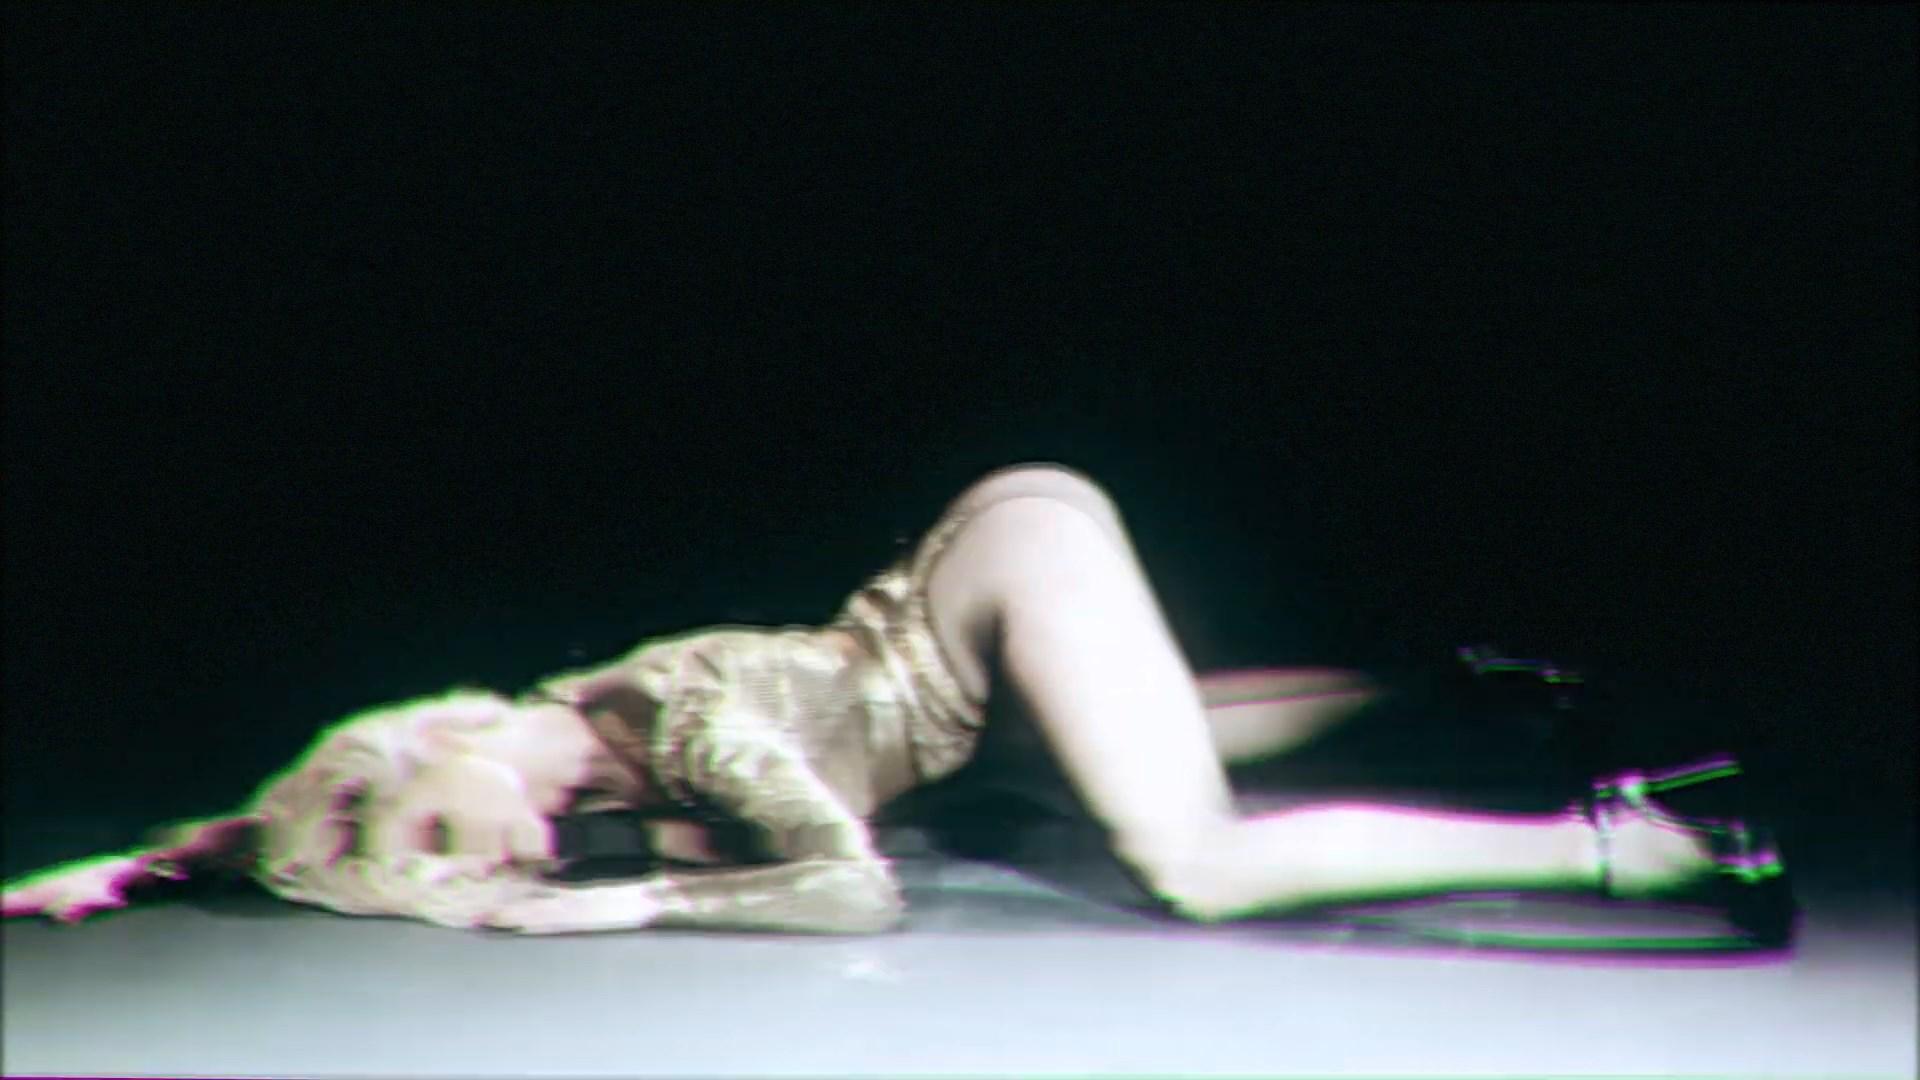 MISHA ROMANOVA - MAKEUP [Премьера клипа].mp4_snapshot_00.21_[2019.04.19_11.46.11].jpg